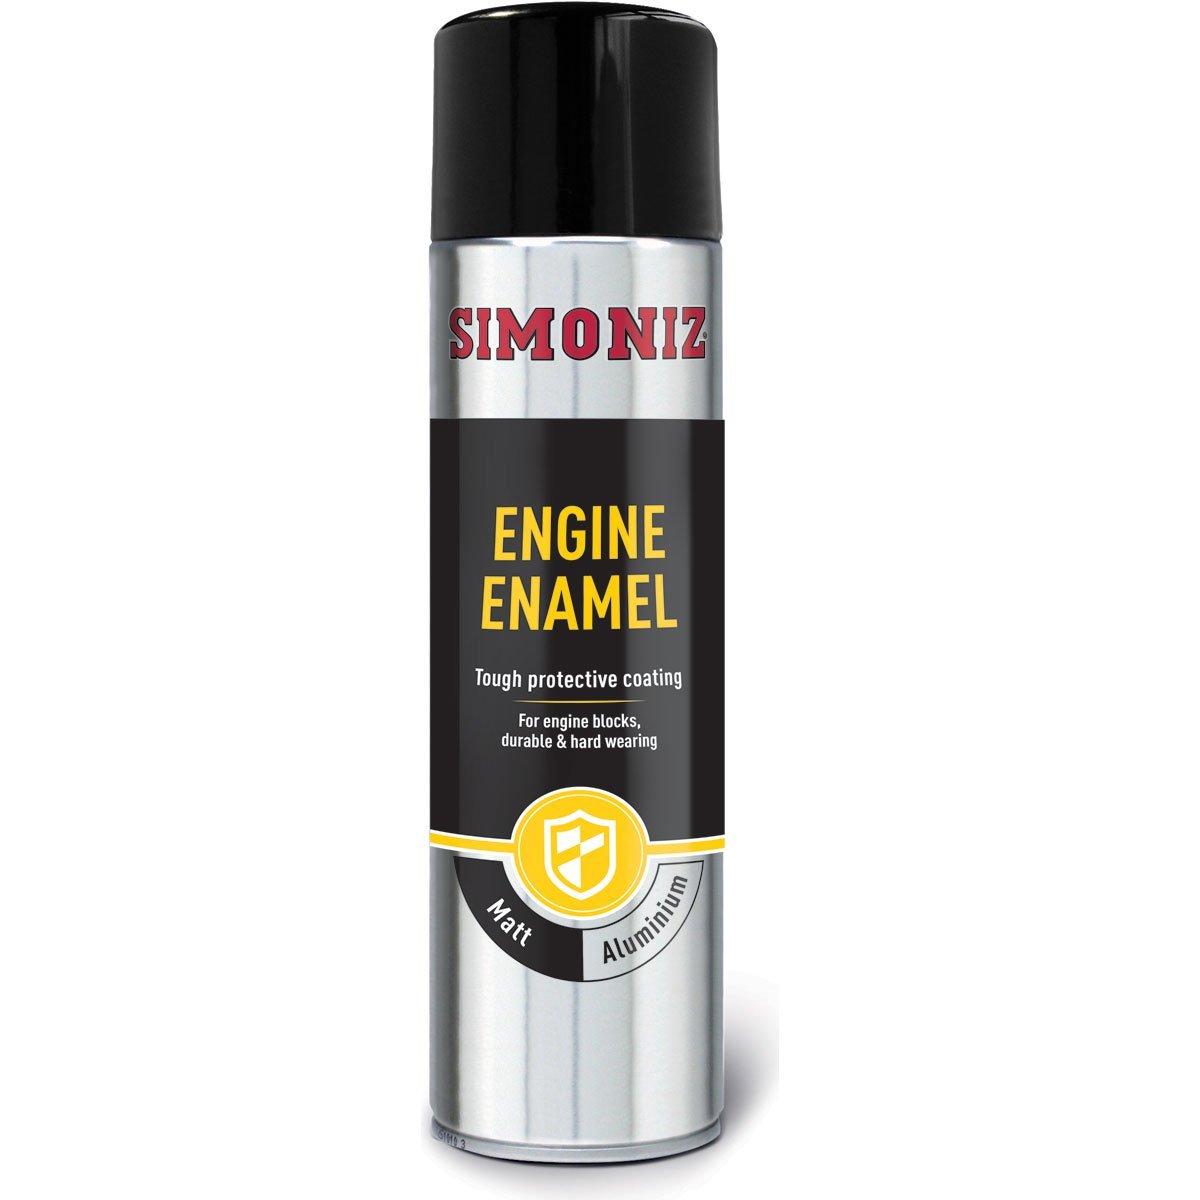 Simoniz Aluminium Engine Enamel One Coat Tough Paint Spray Can - 500ml HOLTS LOYSIMVHT31C